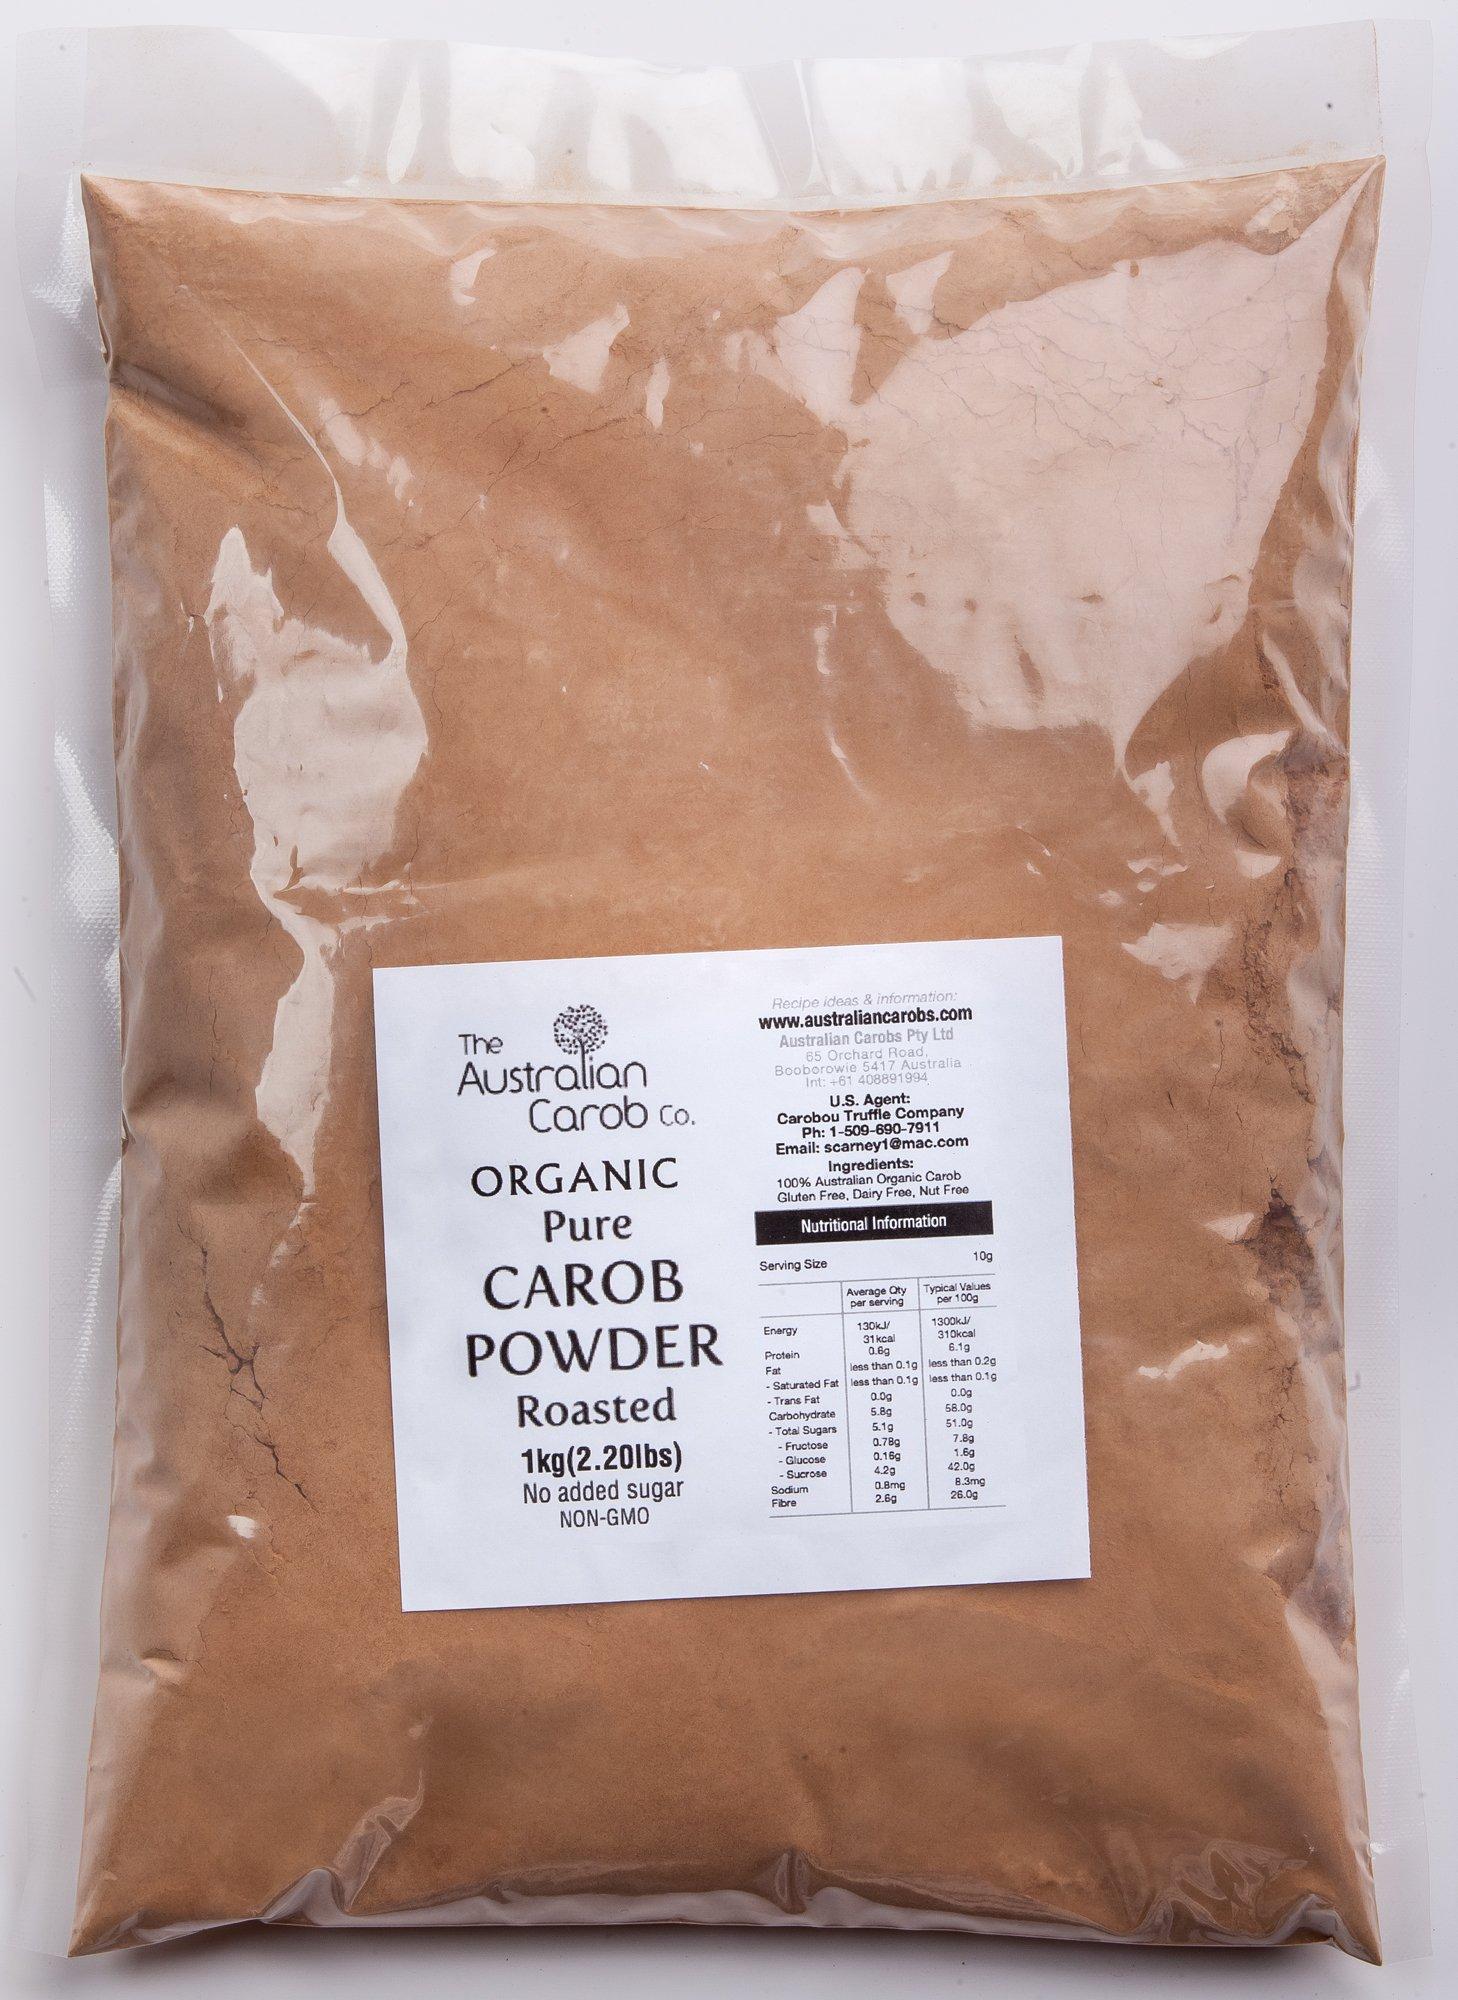 Organic Carob, Australian, Roasted Carob Powder, Superfood, World's #1 Best Tasting, NON-GMO, Roasted Carob Powder, 2.2lb,Vegan,Organic Carob Powder,Carob, Aussie SharkBar,New Generation Carob, Paleo by The Australian Carob Co.